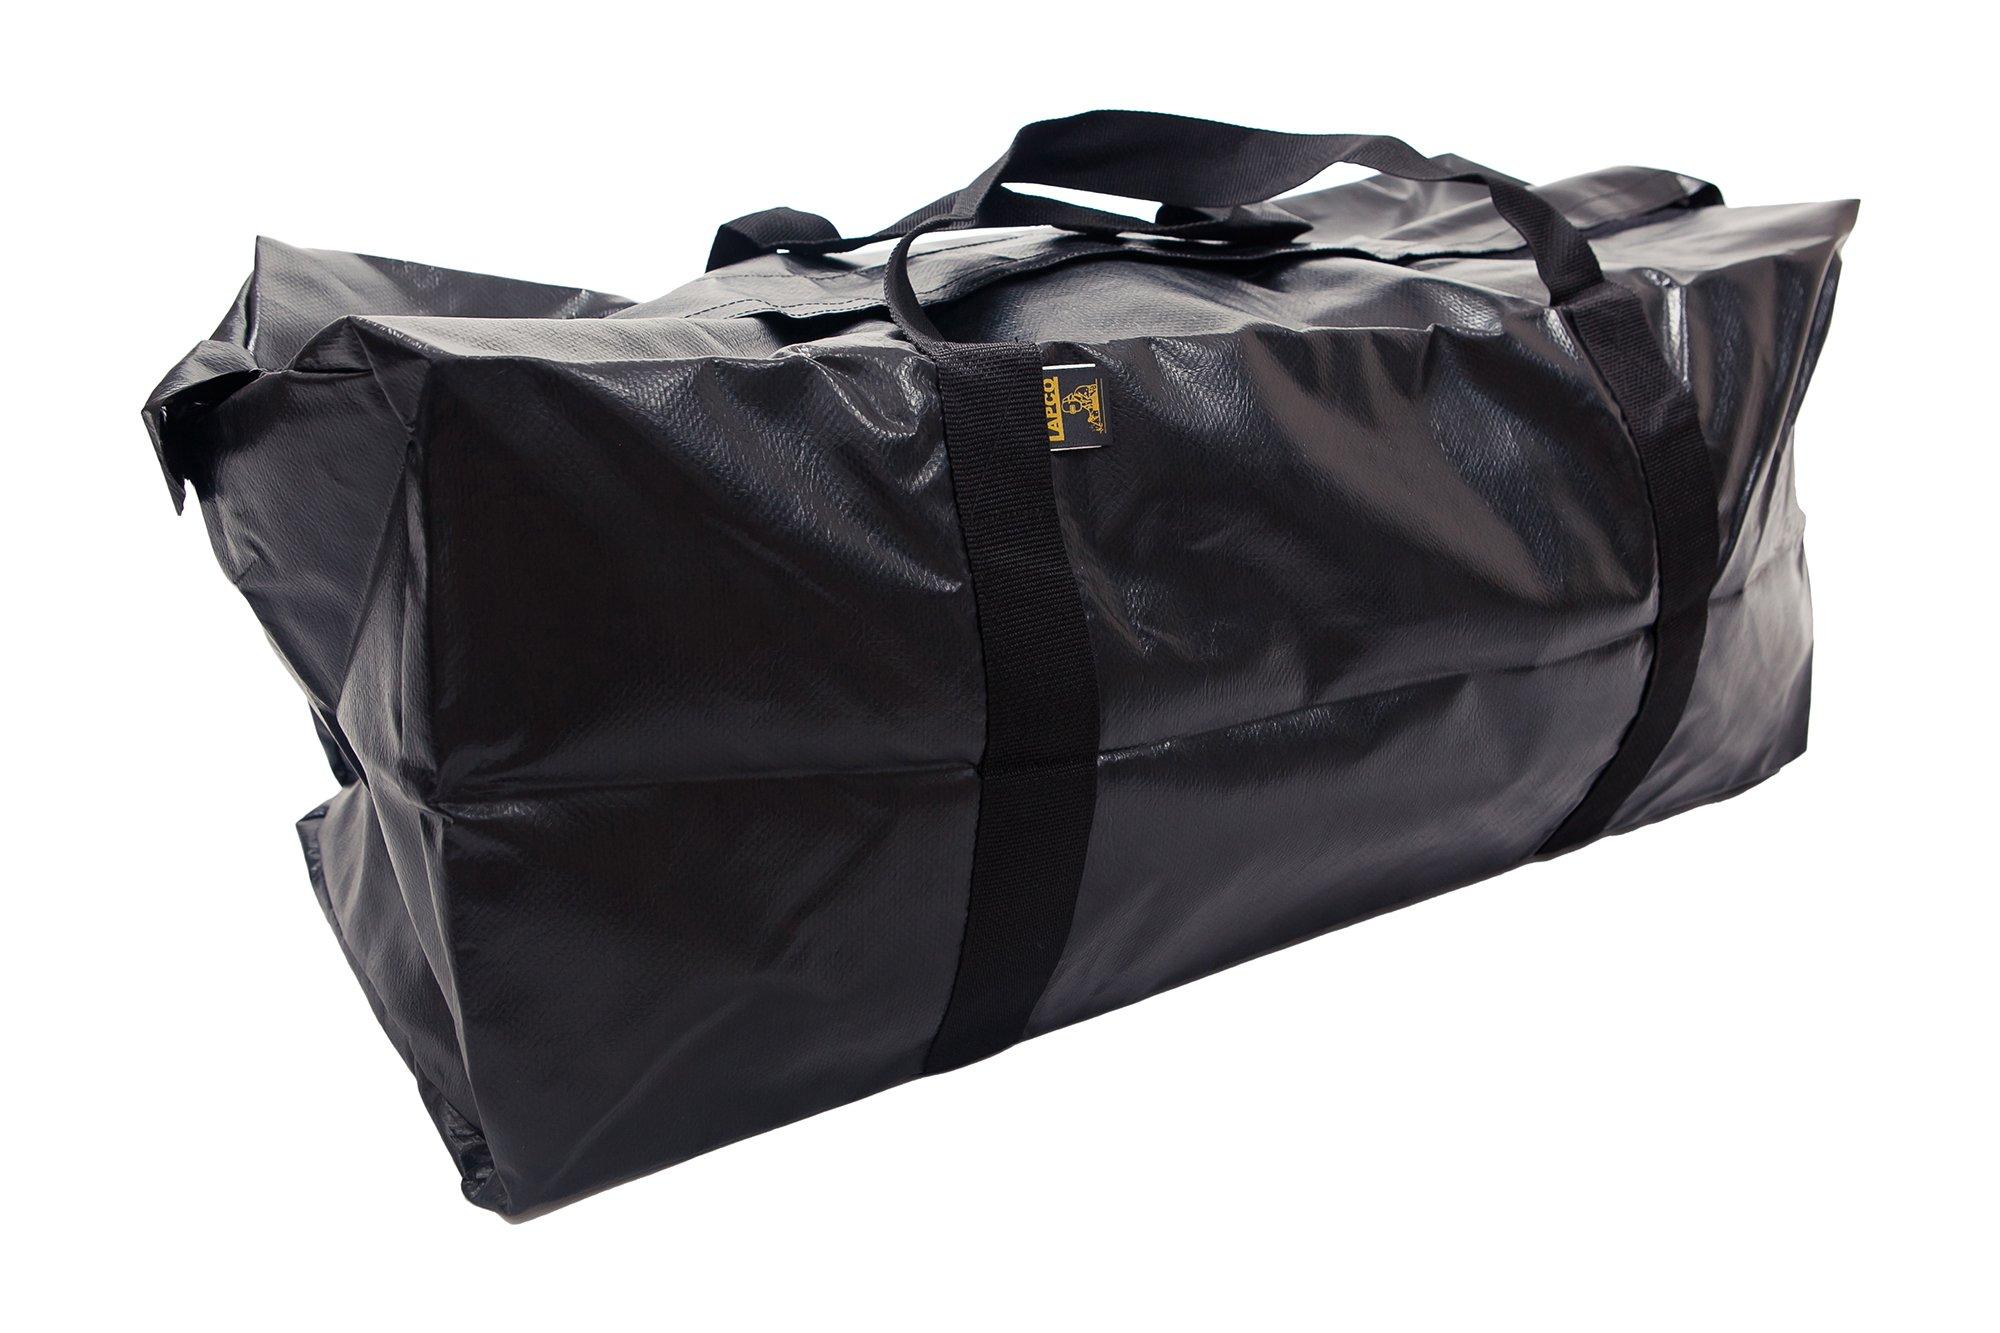 Lapco FR LAP-BV1230BLK Heavy-Duty Weather-Resistant Vinyl Bag, 18 oz, Medium, Black